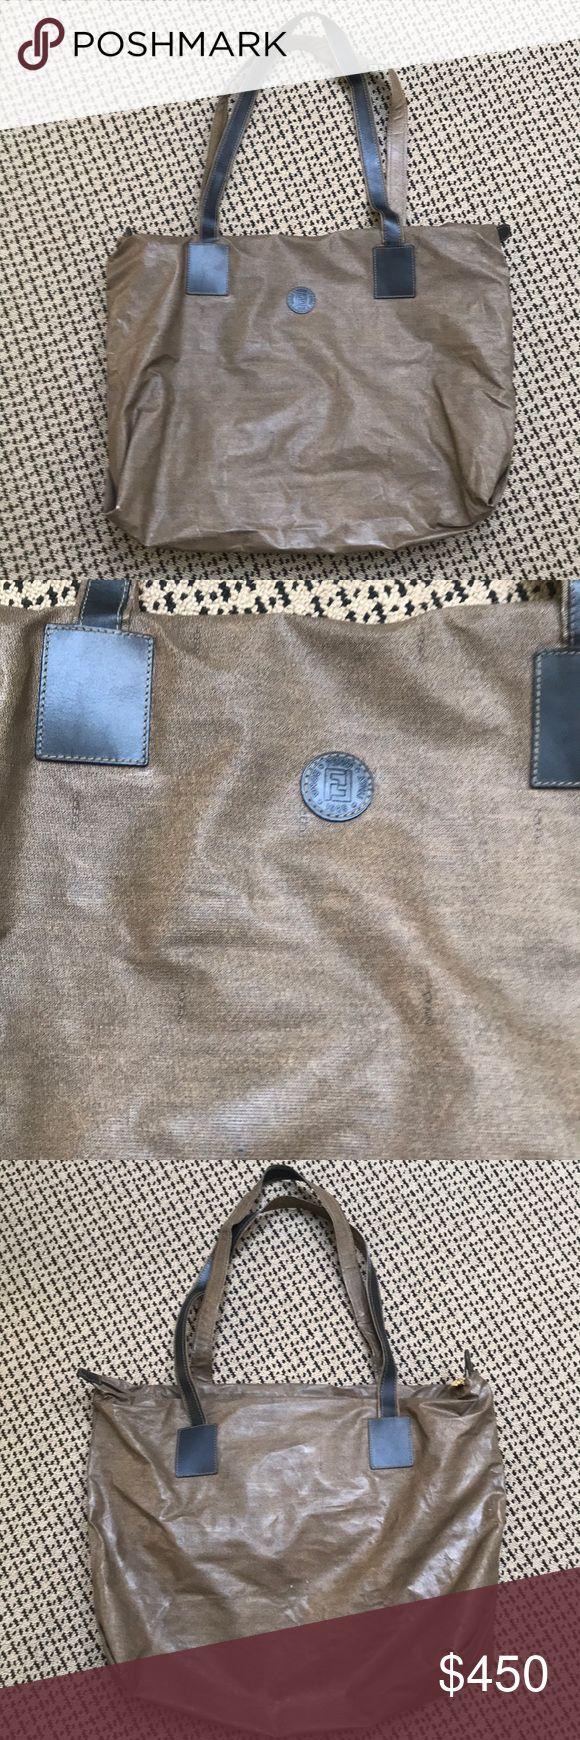 Fendi shoulder bag Fendi bag  No rips and working zipper  Great condition Fendi …